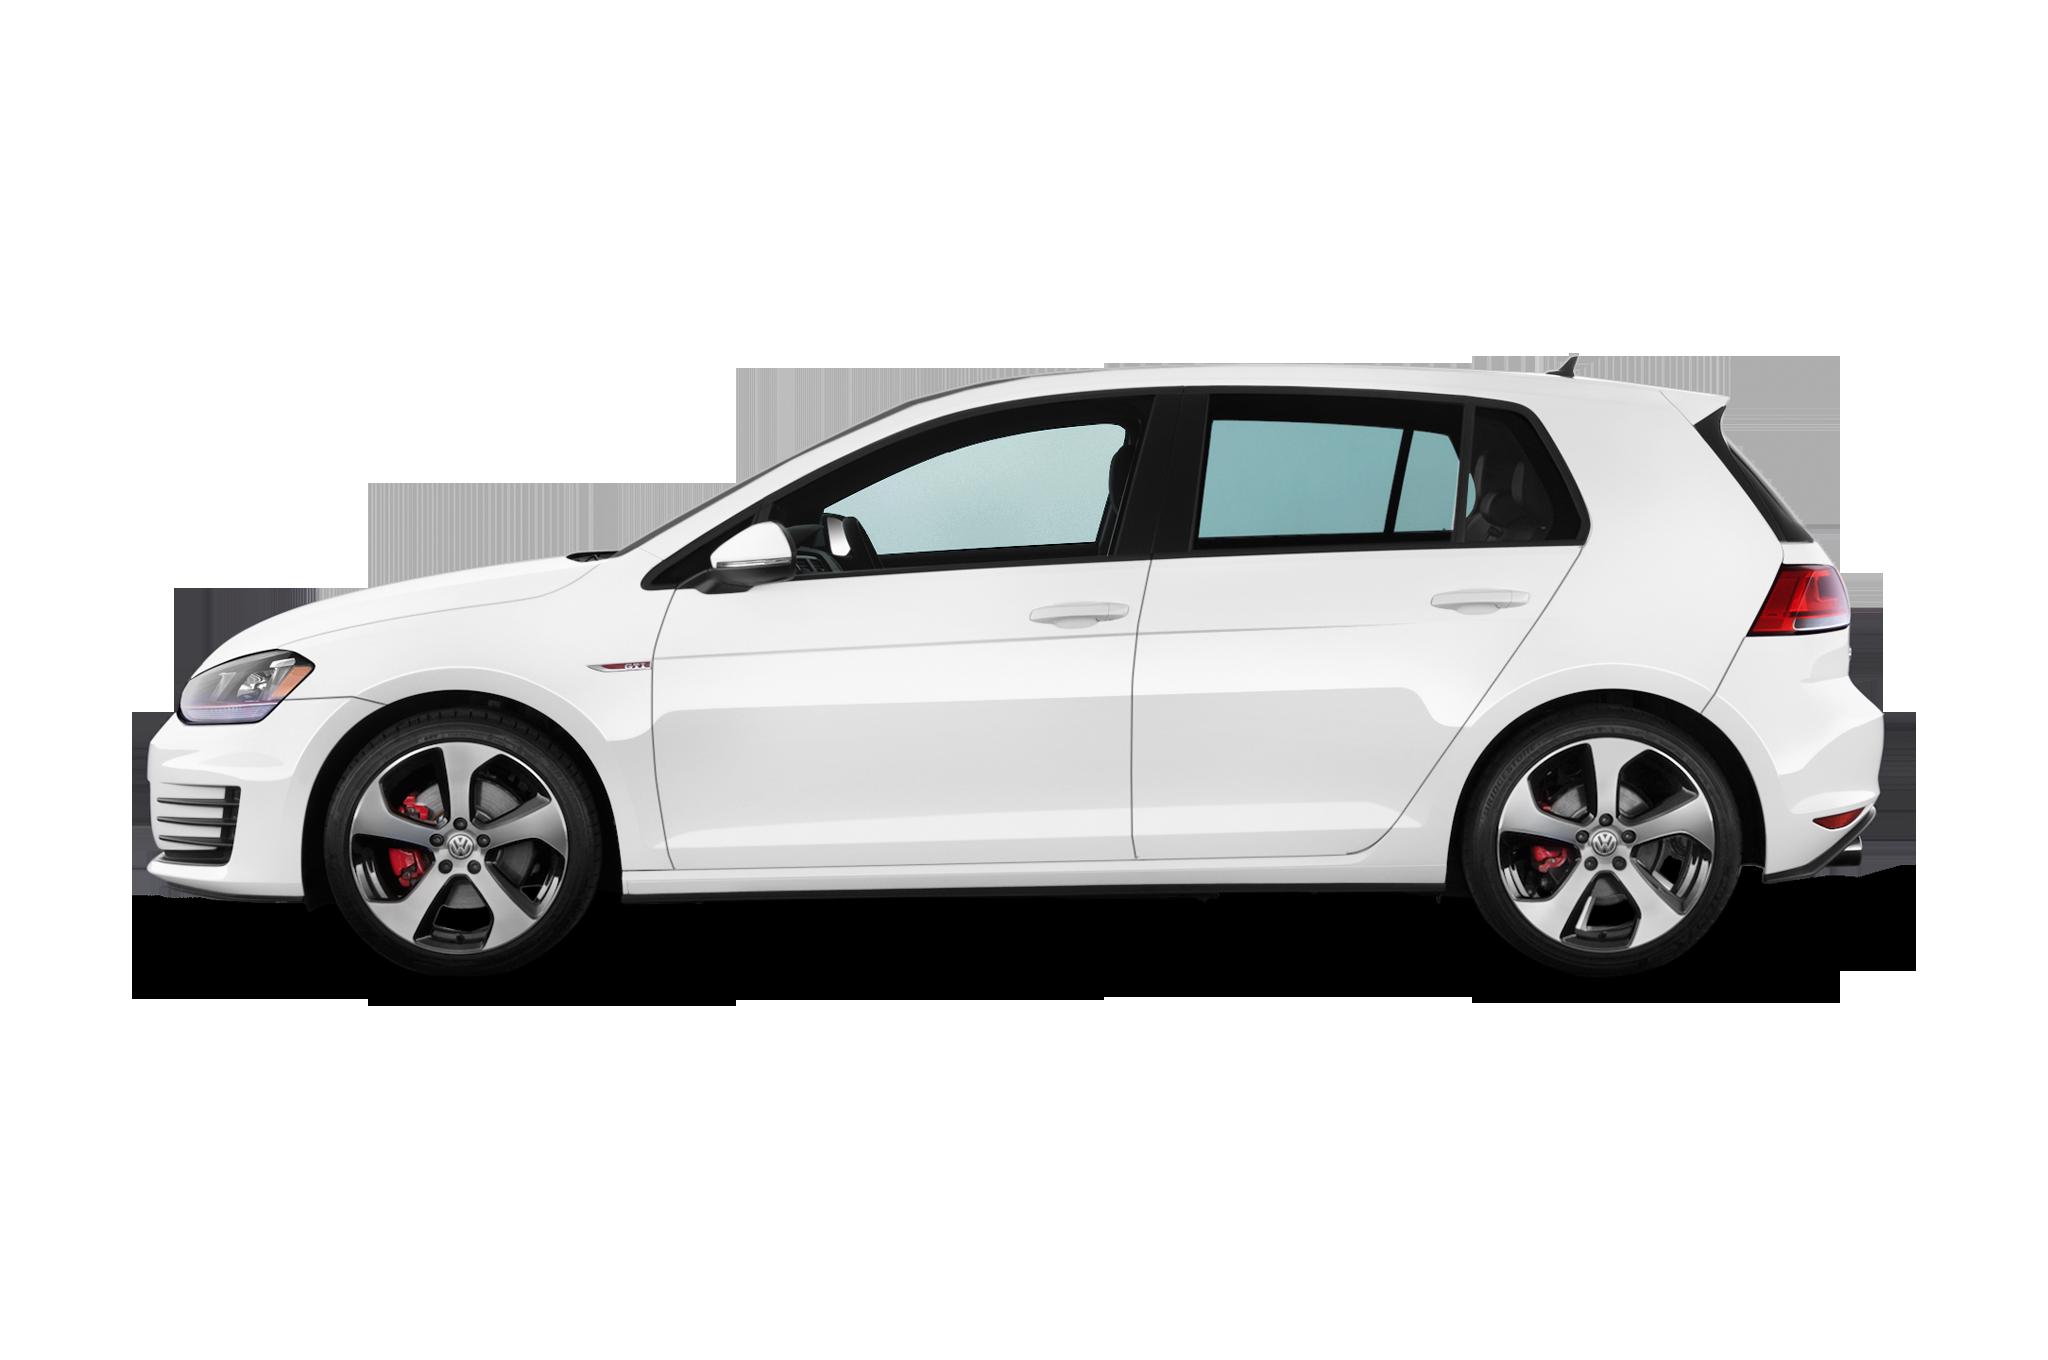 2015 volkswagen golf gti s performance pack review automobile. Black Bedroom Furniture Sets. Home Design Ideas